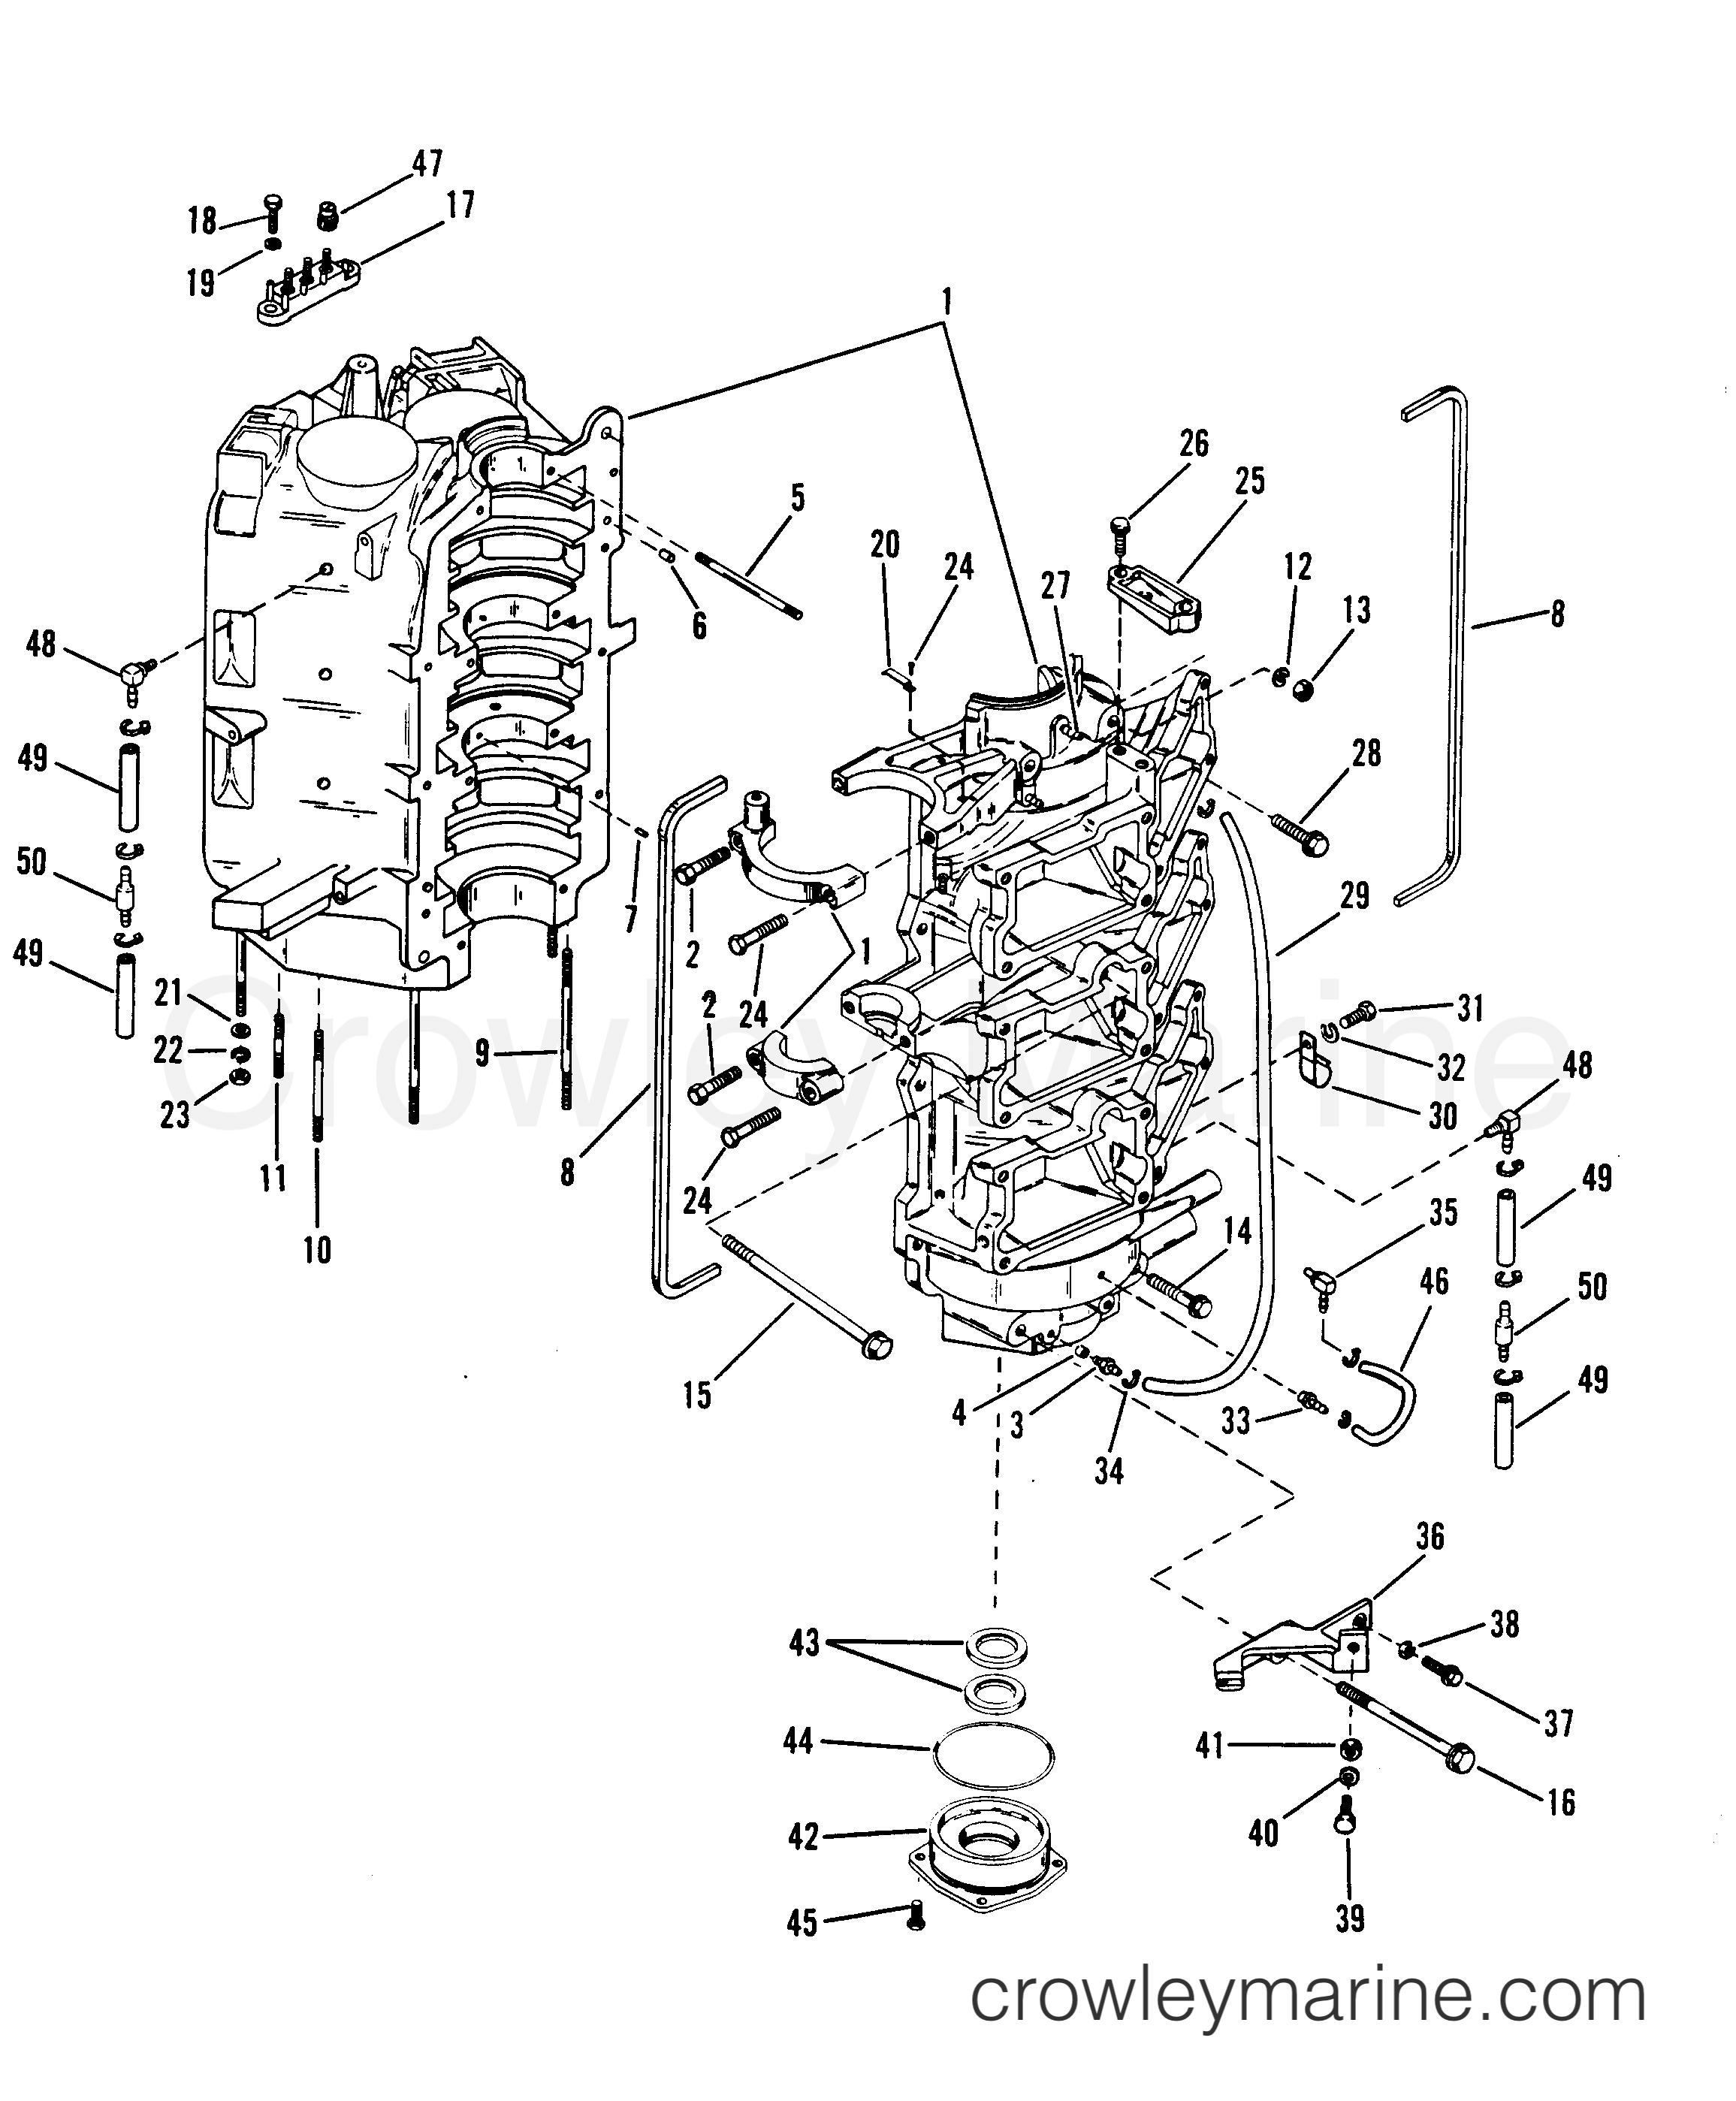 wiring harness starter solenoid rectifier diagram and